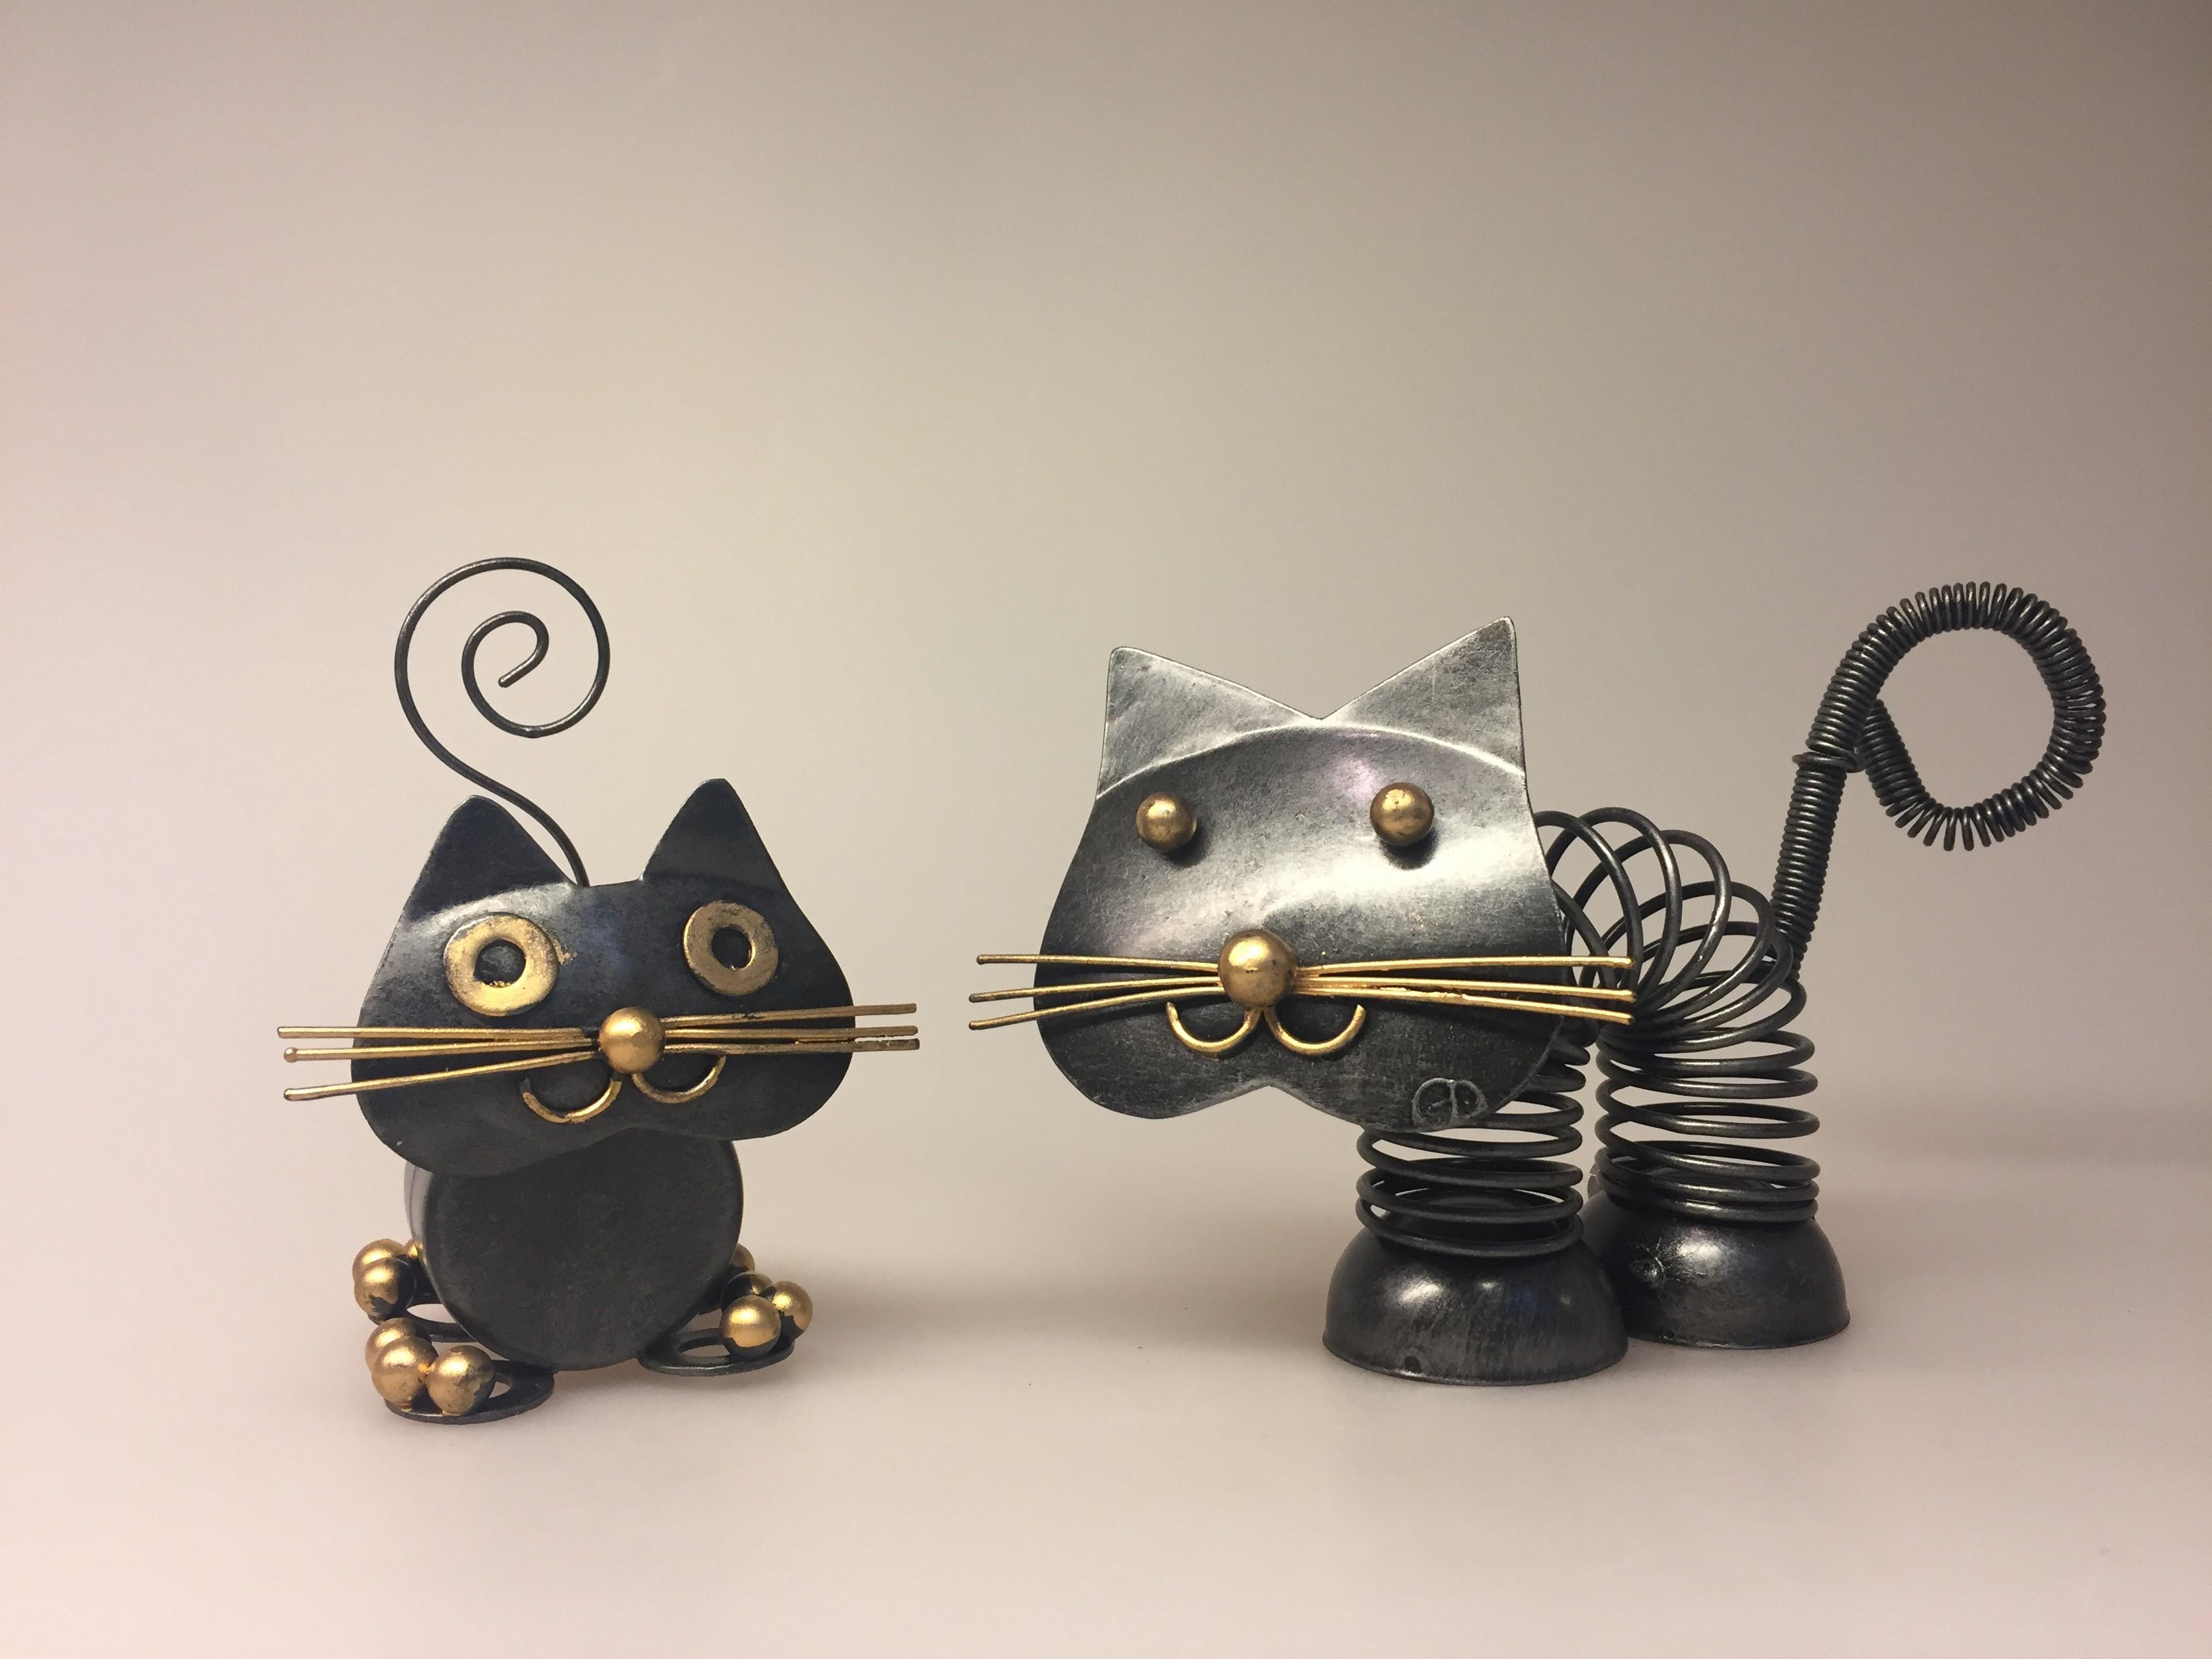 Metalfigur - Sort kat lille Fred, Metalfigur - Sort kat fjeder, metalkat, kattefigur, kat, missekat, mis, sort kat, penge, pengegave, penge i gave, memo, noter, ting med katte, katteting, biti, ribe